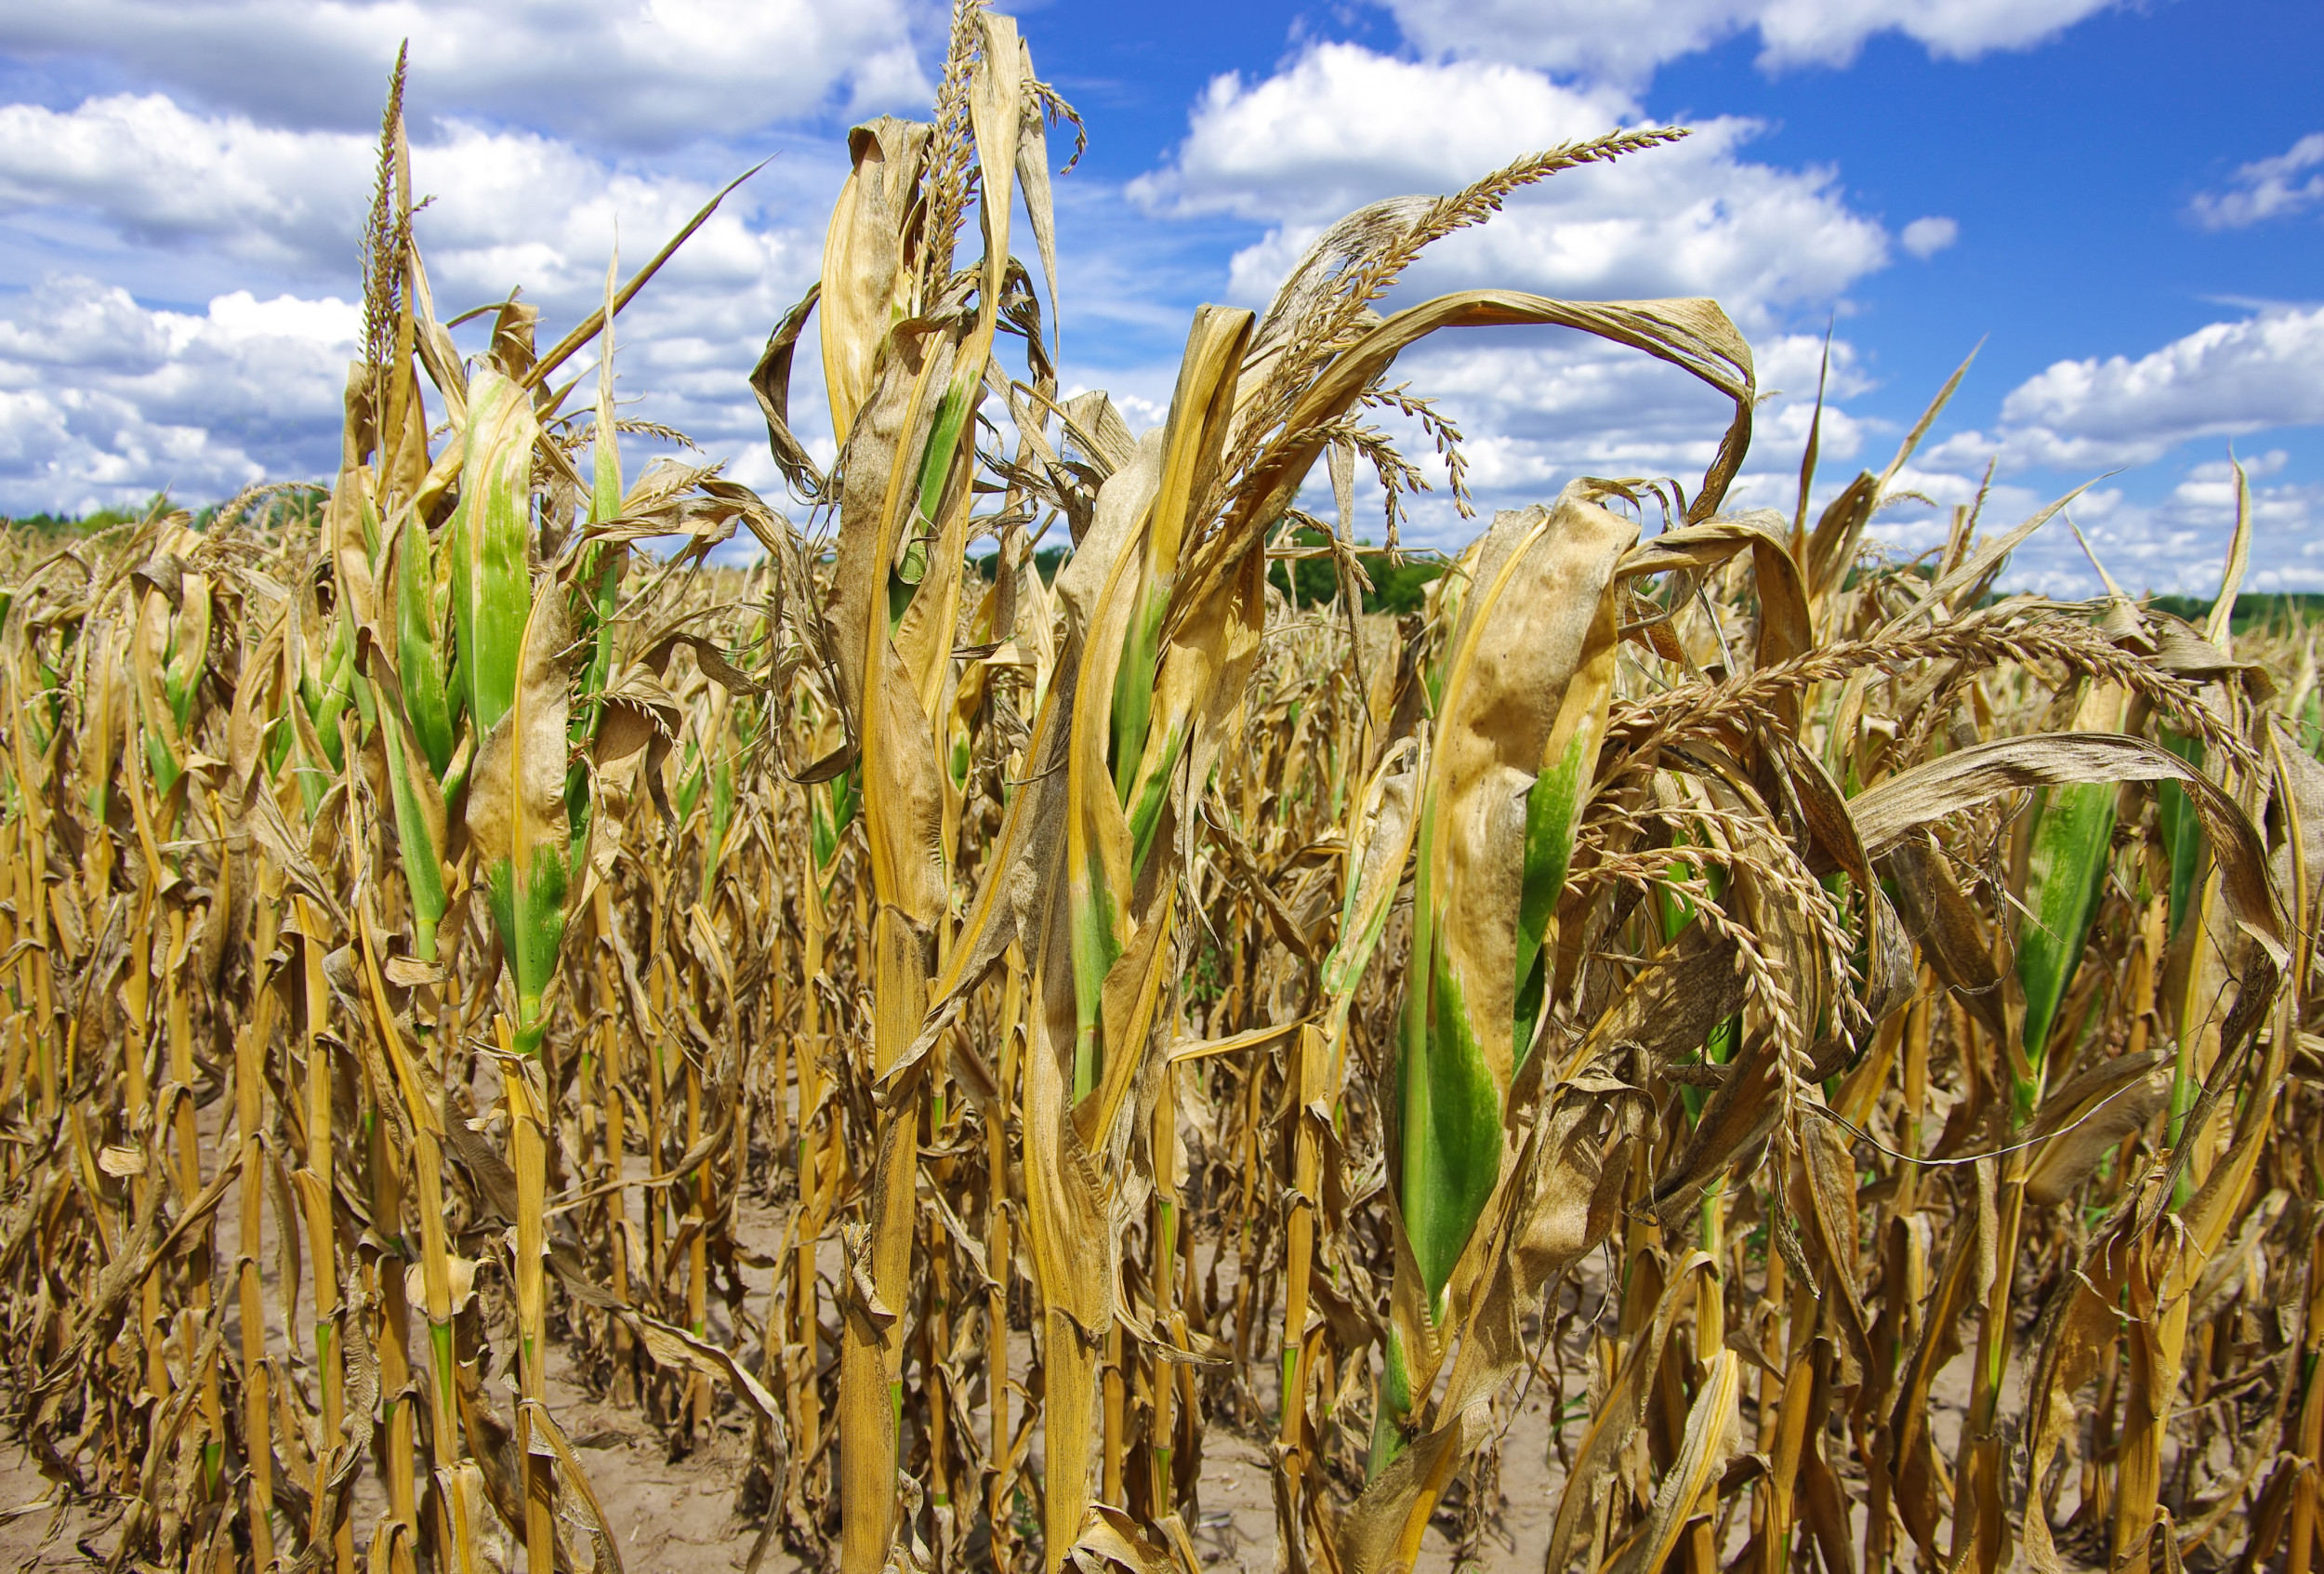 President Ramaphosa: Please help our Eastern Cape farmers